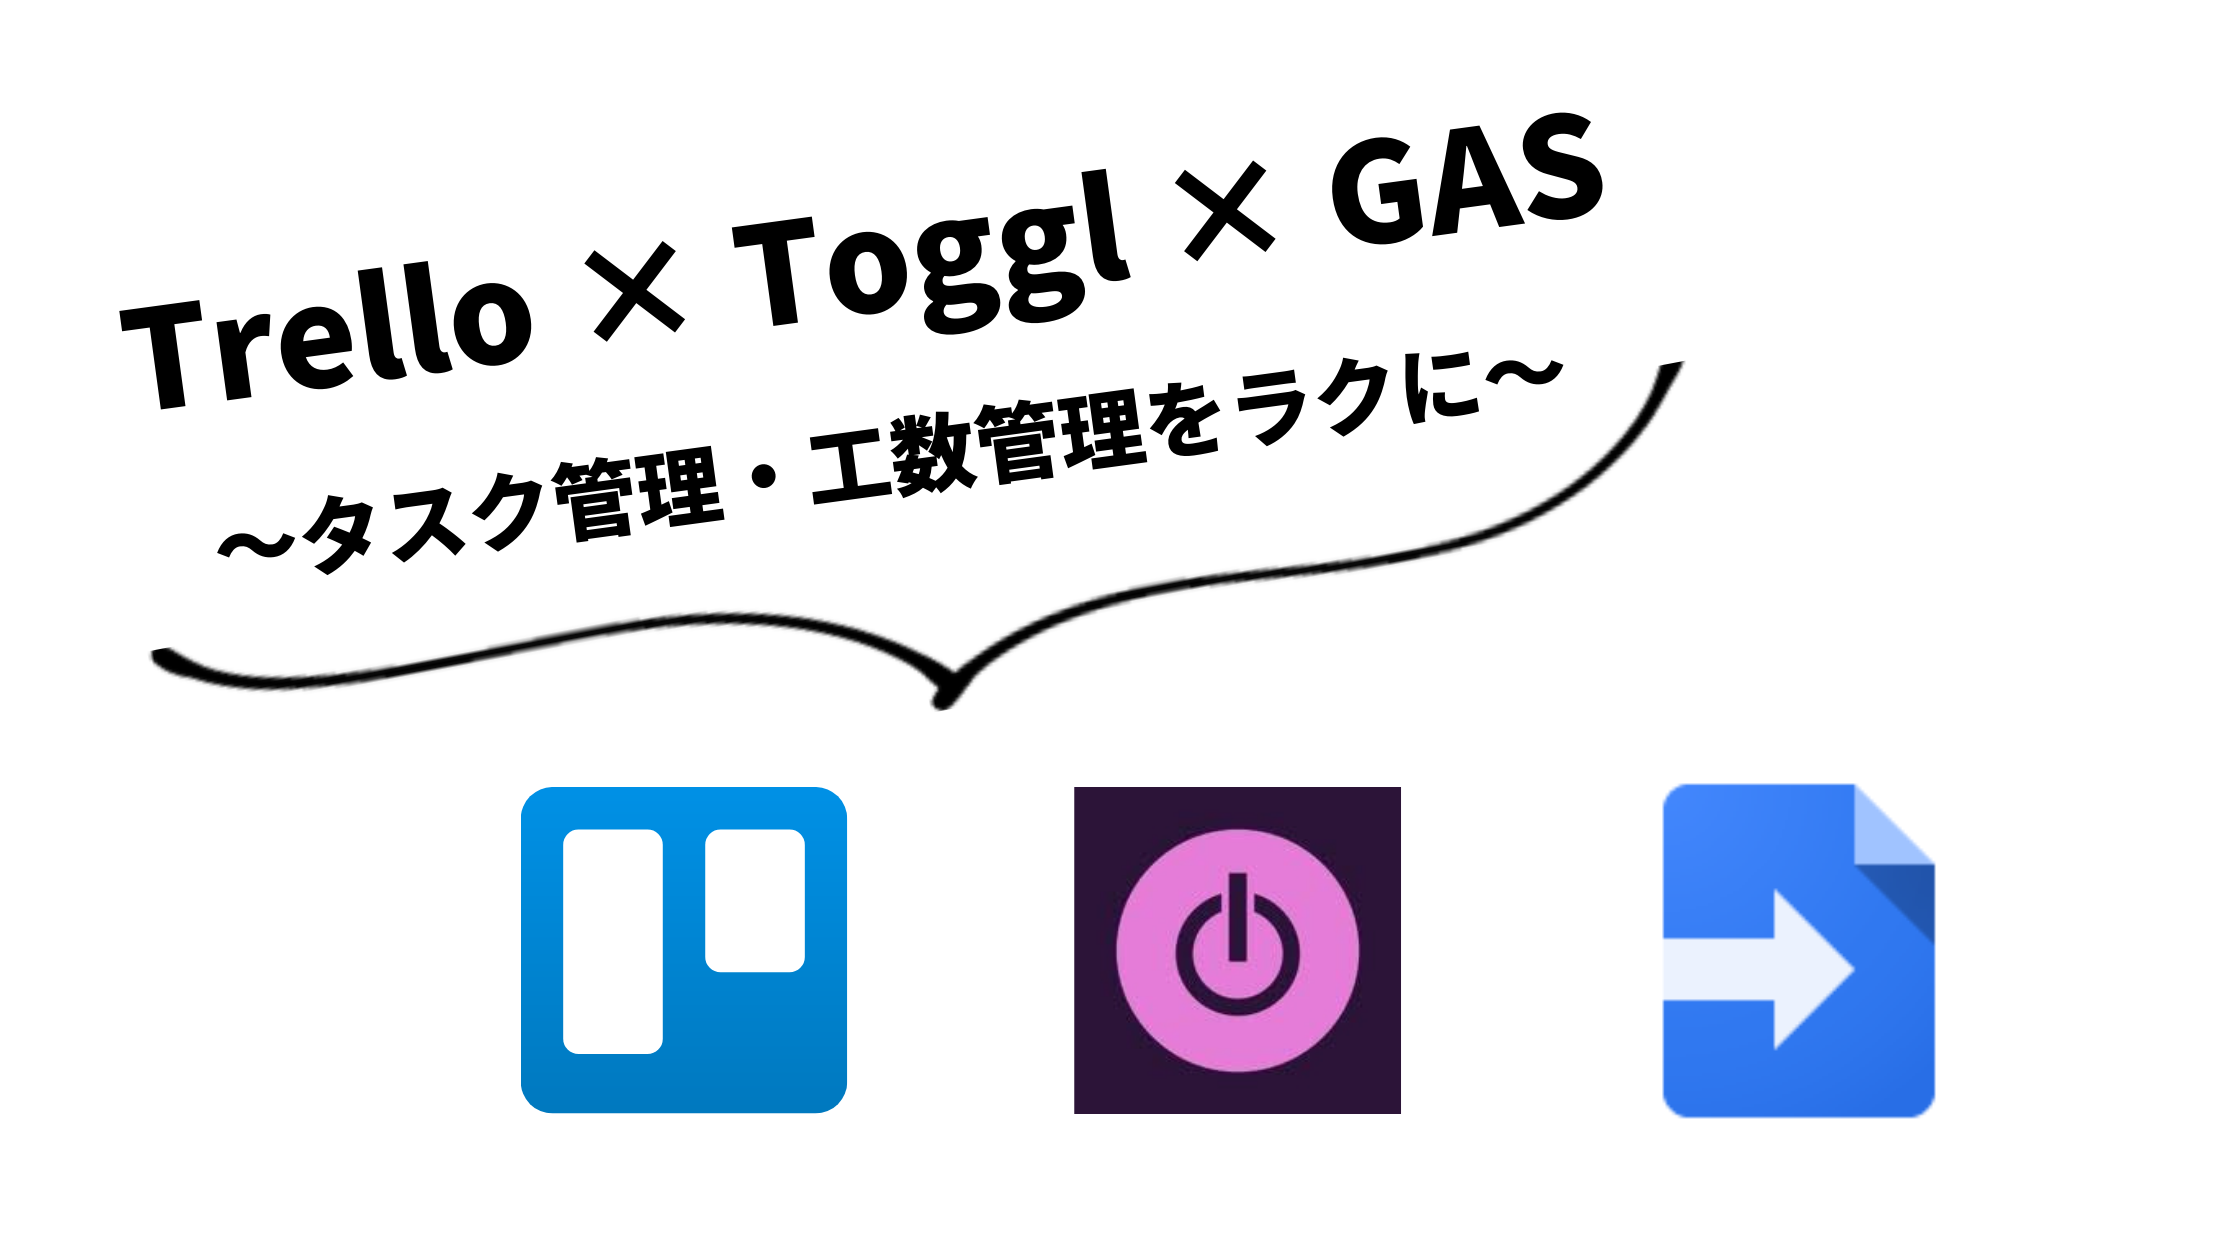 GAS(Google Apps Script)活用例:Trello × Togglでタスク管理・工数管理をラクにする